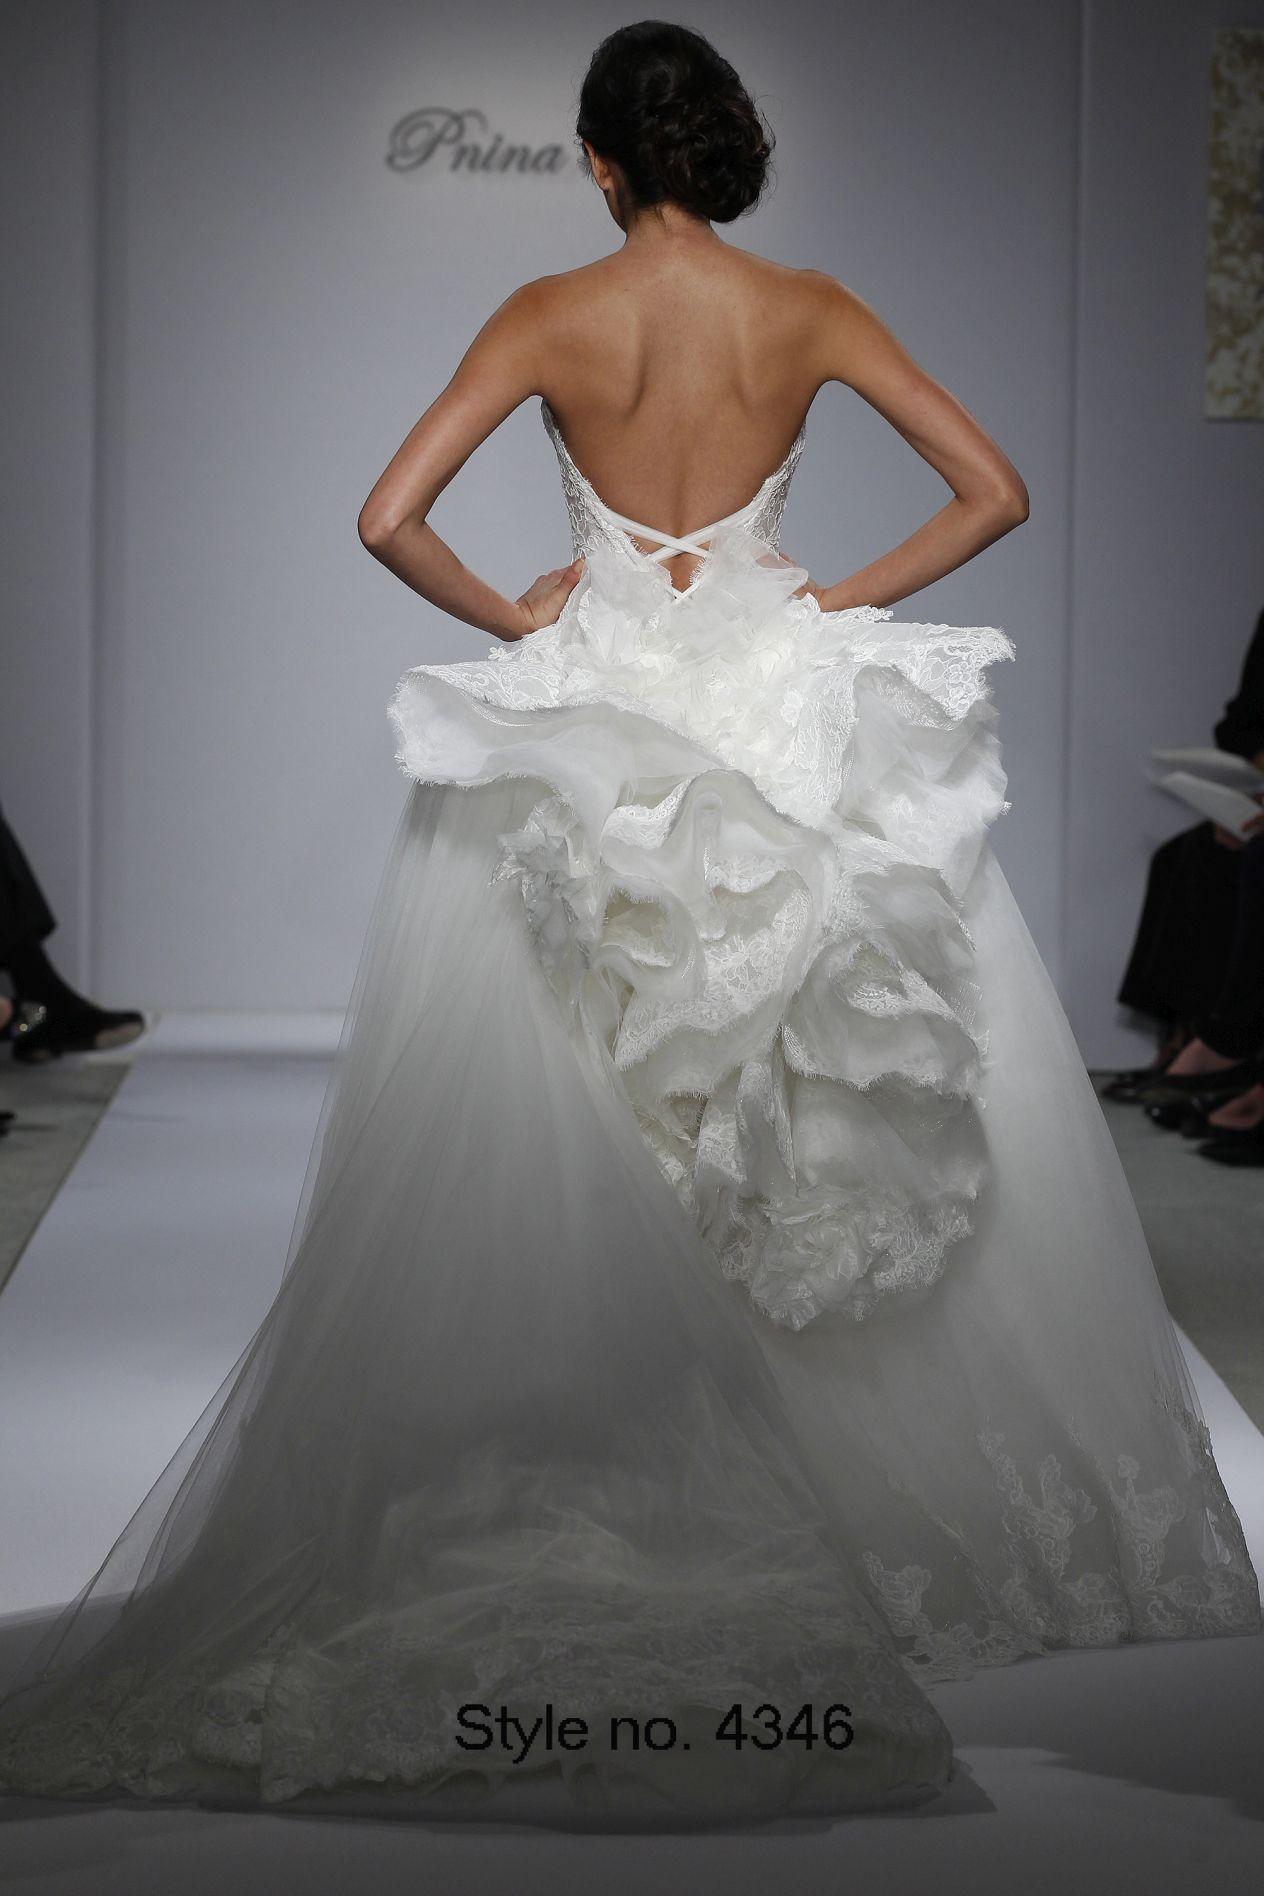 Pnina Tornai 2015 Ball Gown Wedding Dresses Appliqued